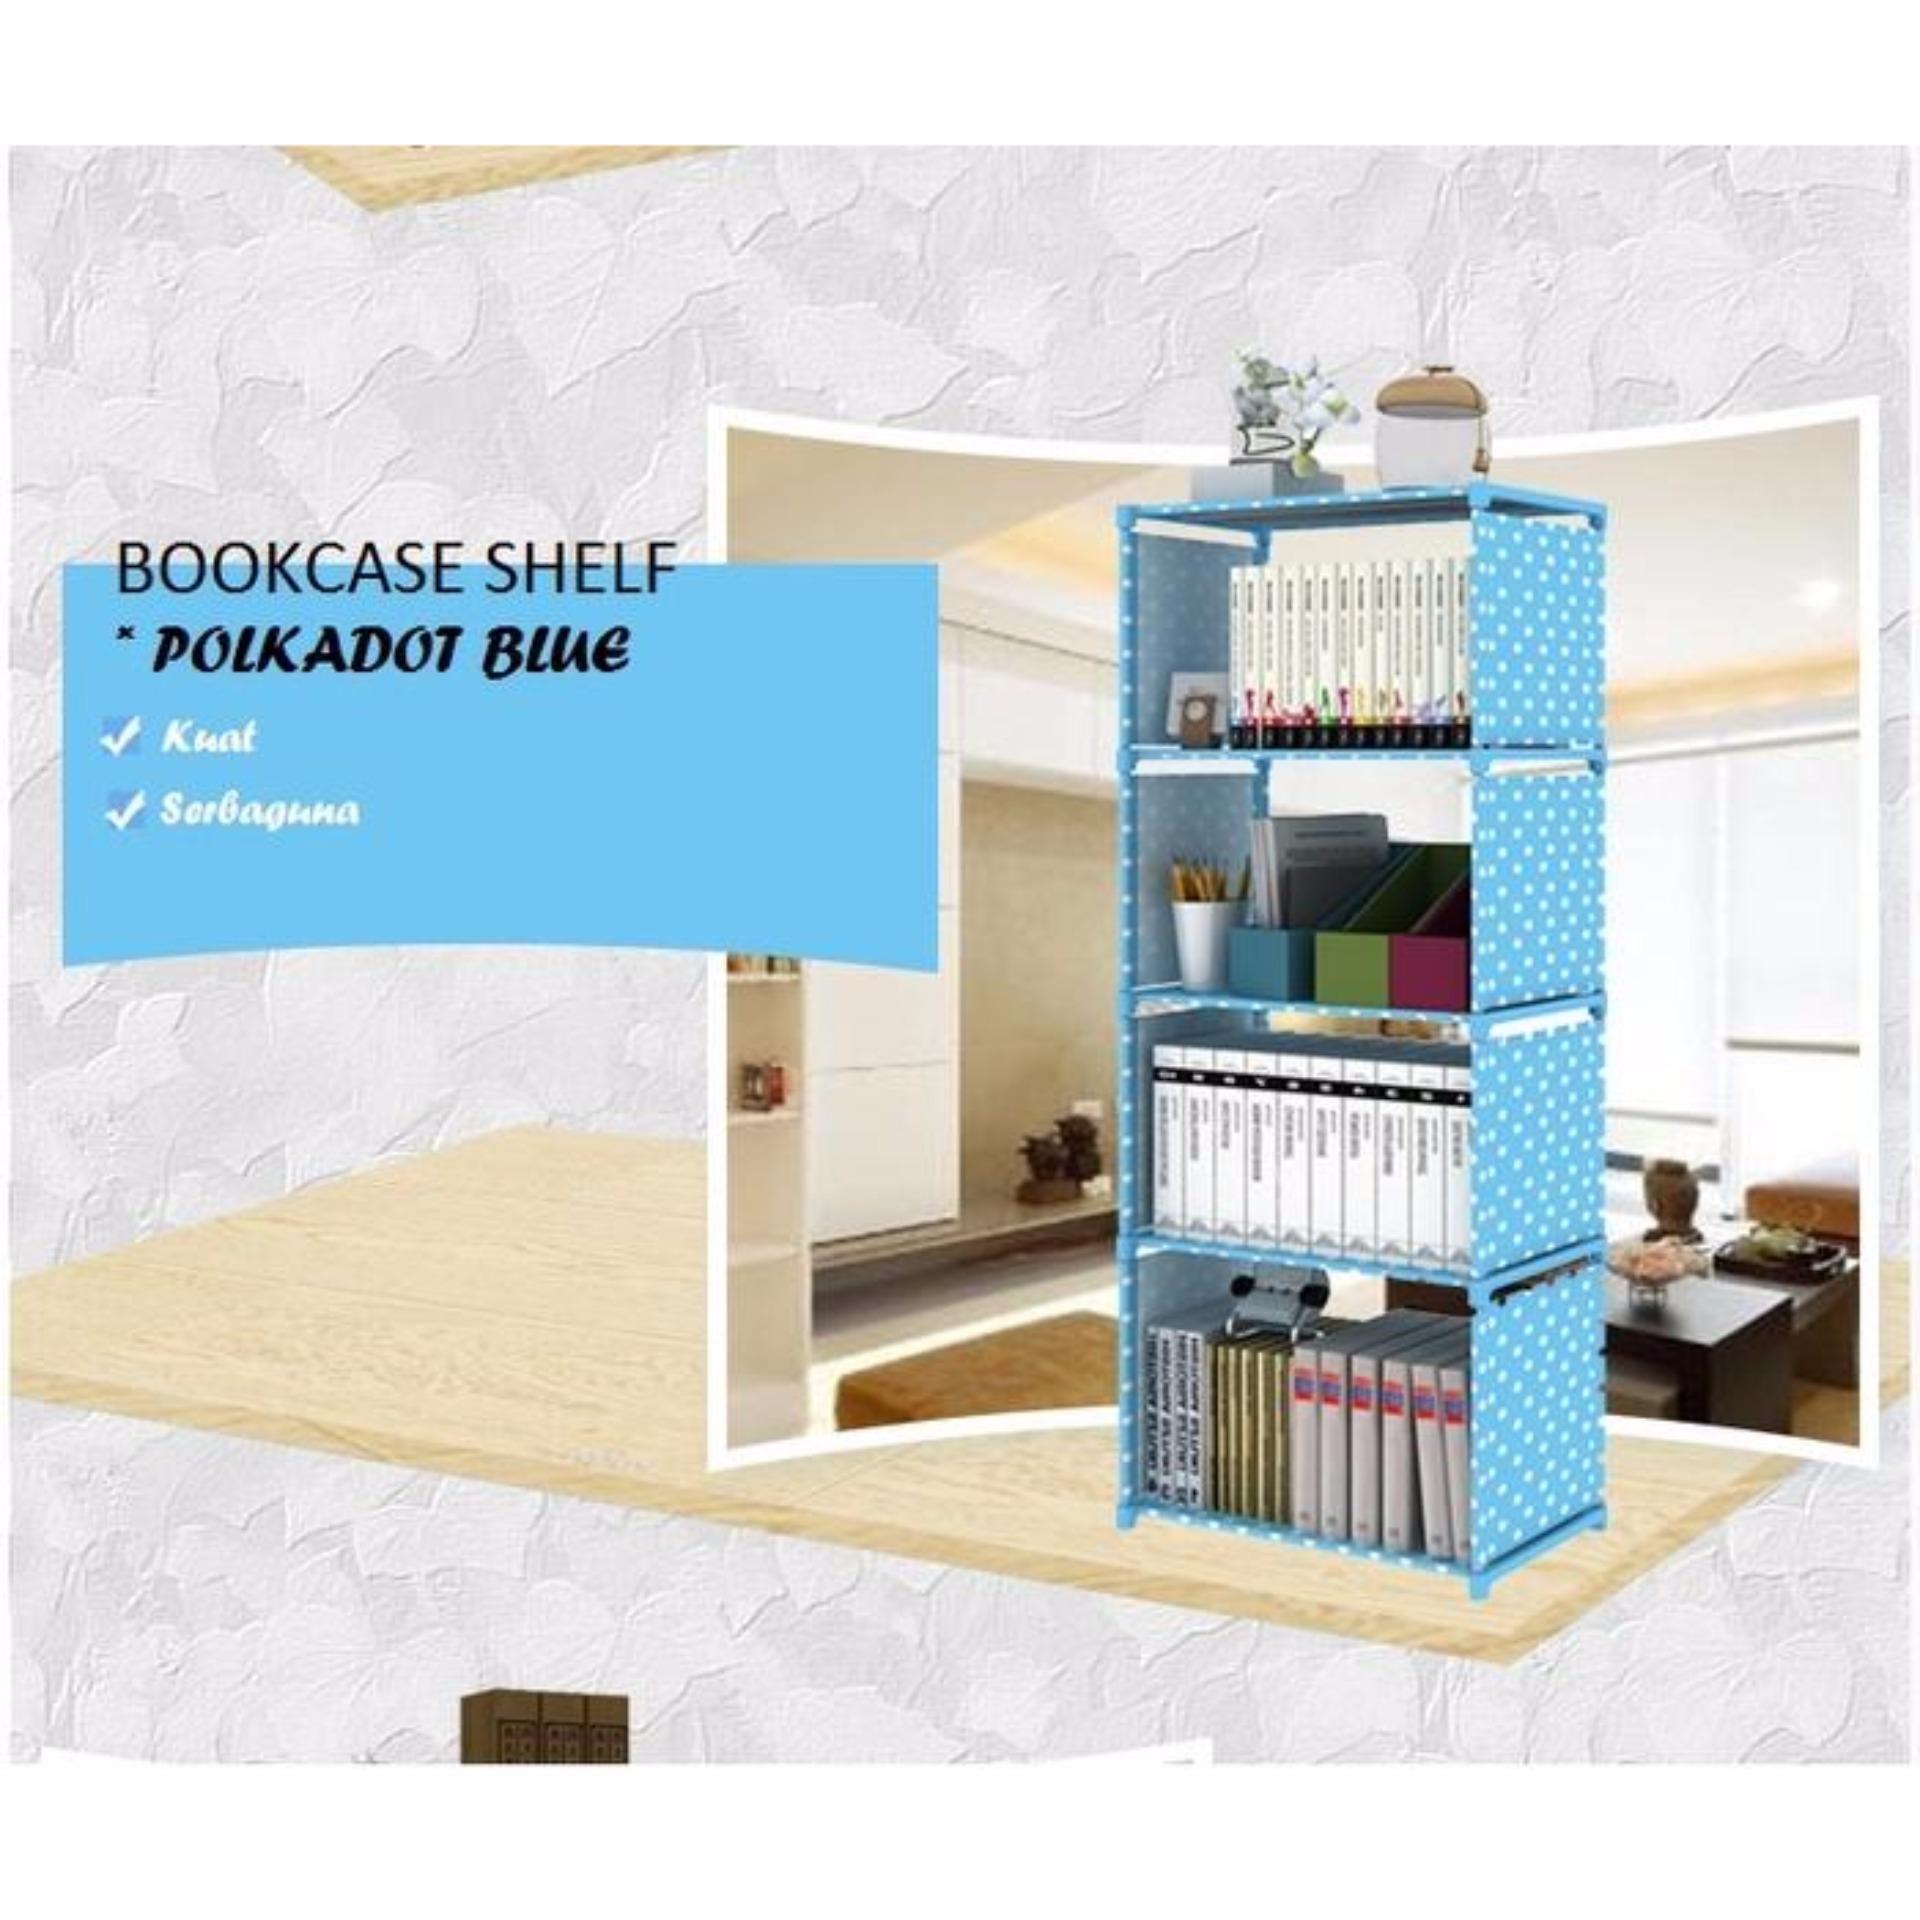 Rak Buku Serbaguna Rak Polkadot Rak Buku 5 Susun Portable Biru Polkadot Diskon Indonesia